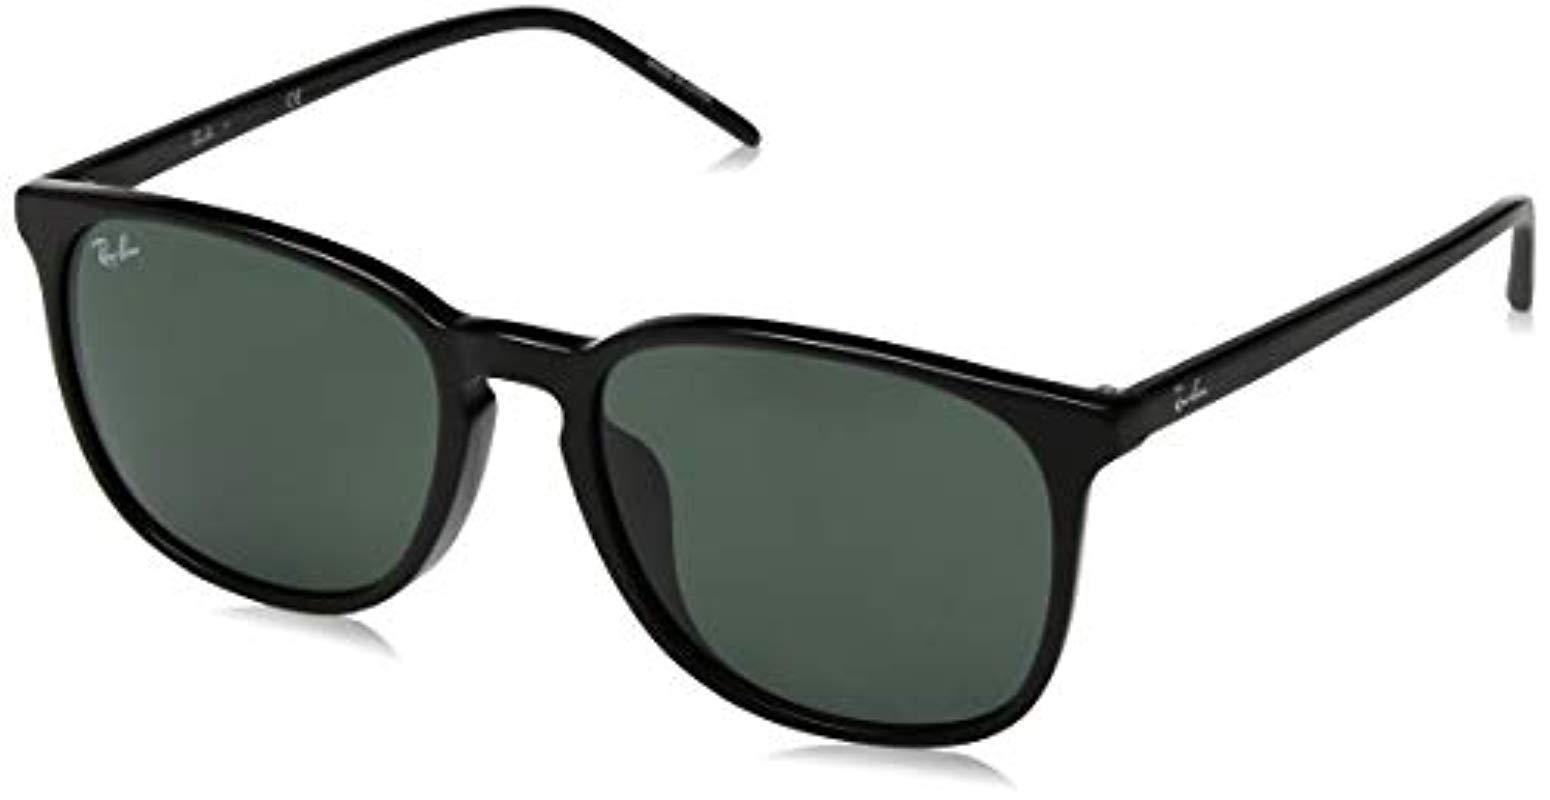 53d84b25b2 Lyst - Ray-Ban Rb4387f Sunglasses in Black for Men